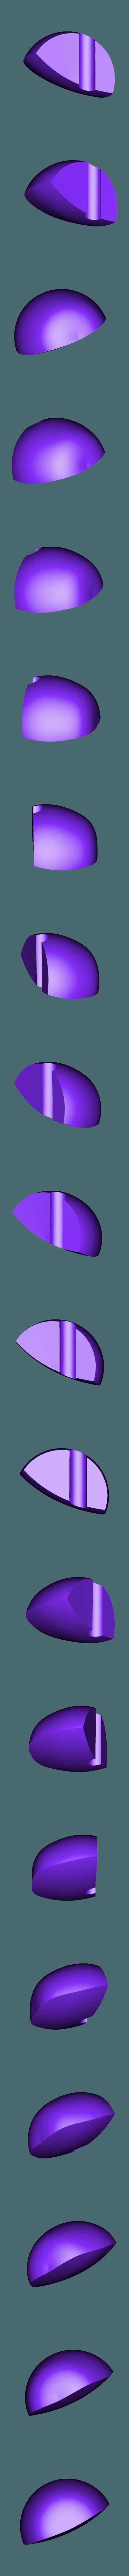 eye right white.stl Télécharger fichier STL gratuit Badtz-Maru (バッドばつ丸, Baddo Batsu Maru) • Modèle pour impression 3D, Jangie